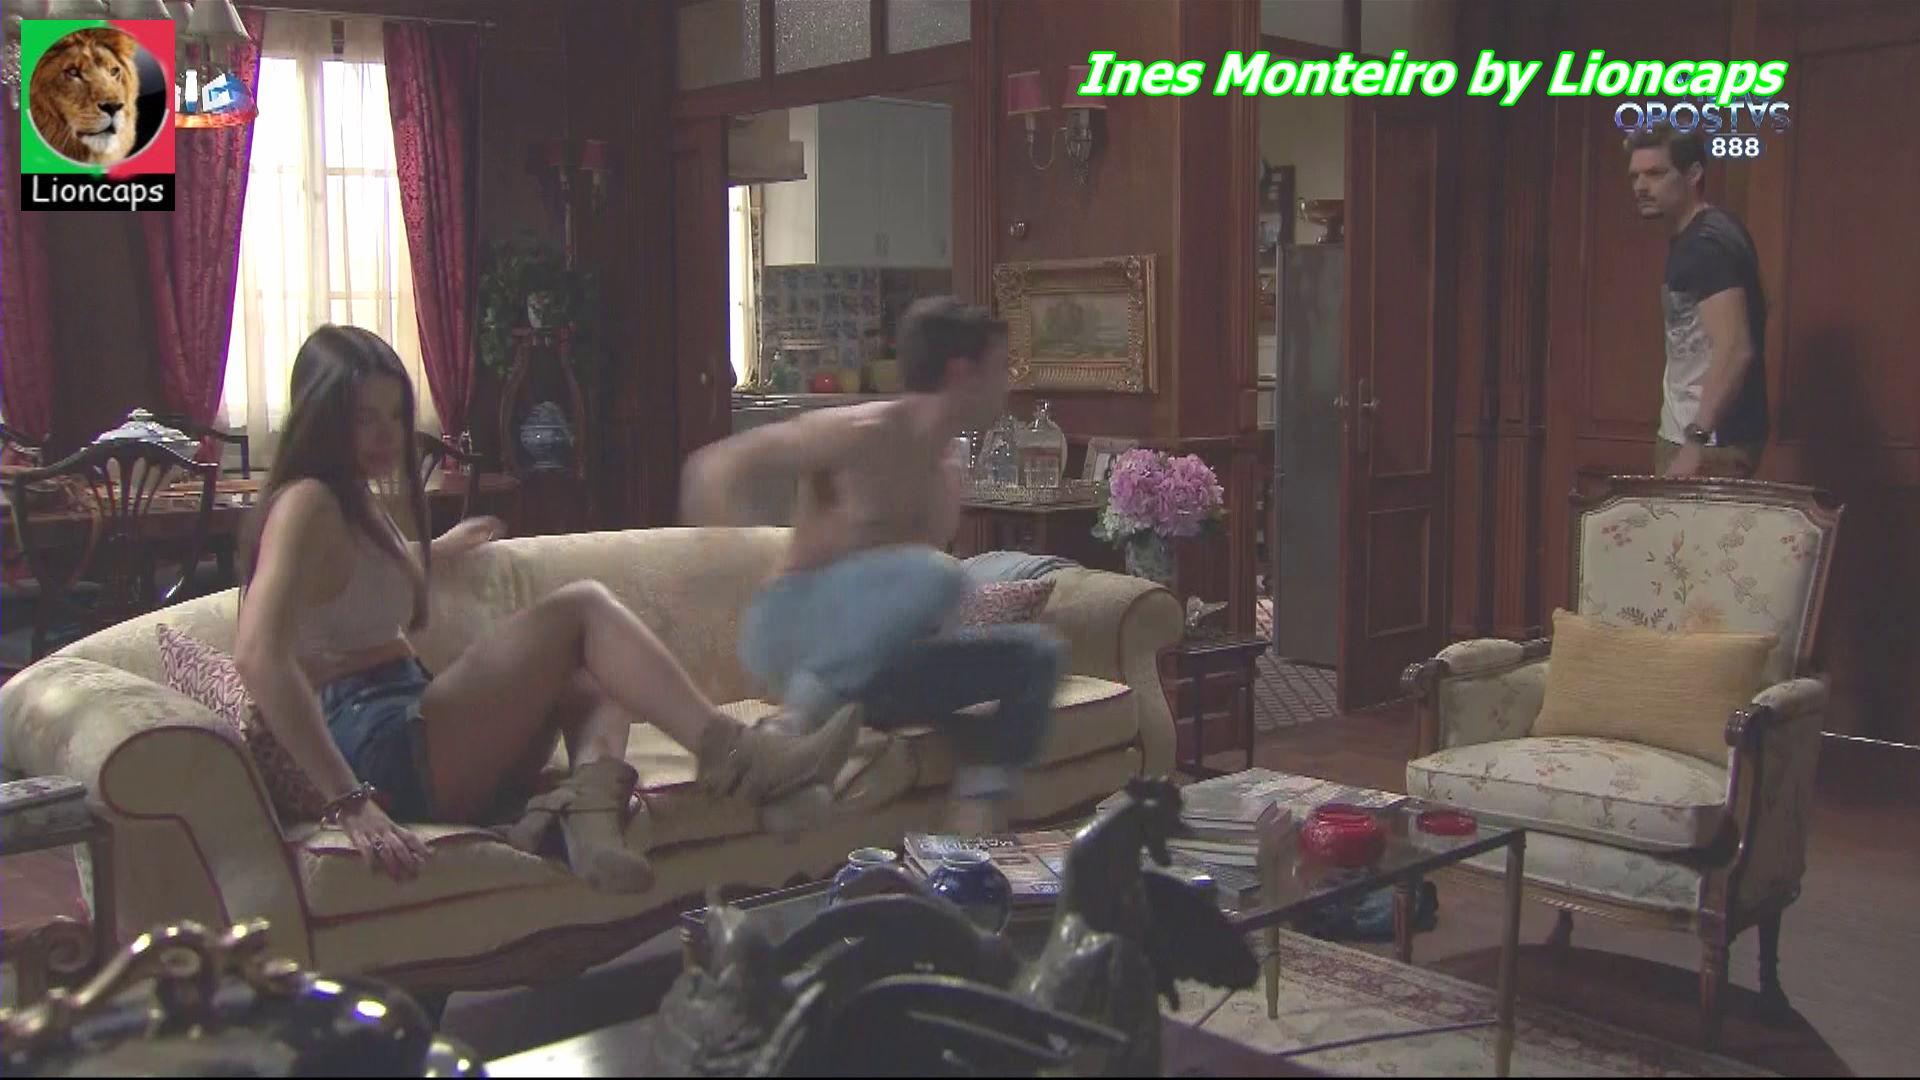 454320553_ines_monteiro_vs181111_0277_122_353lo.JPG